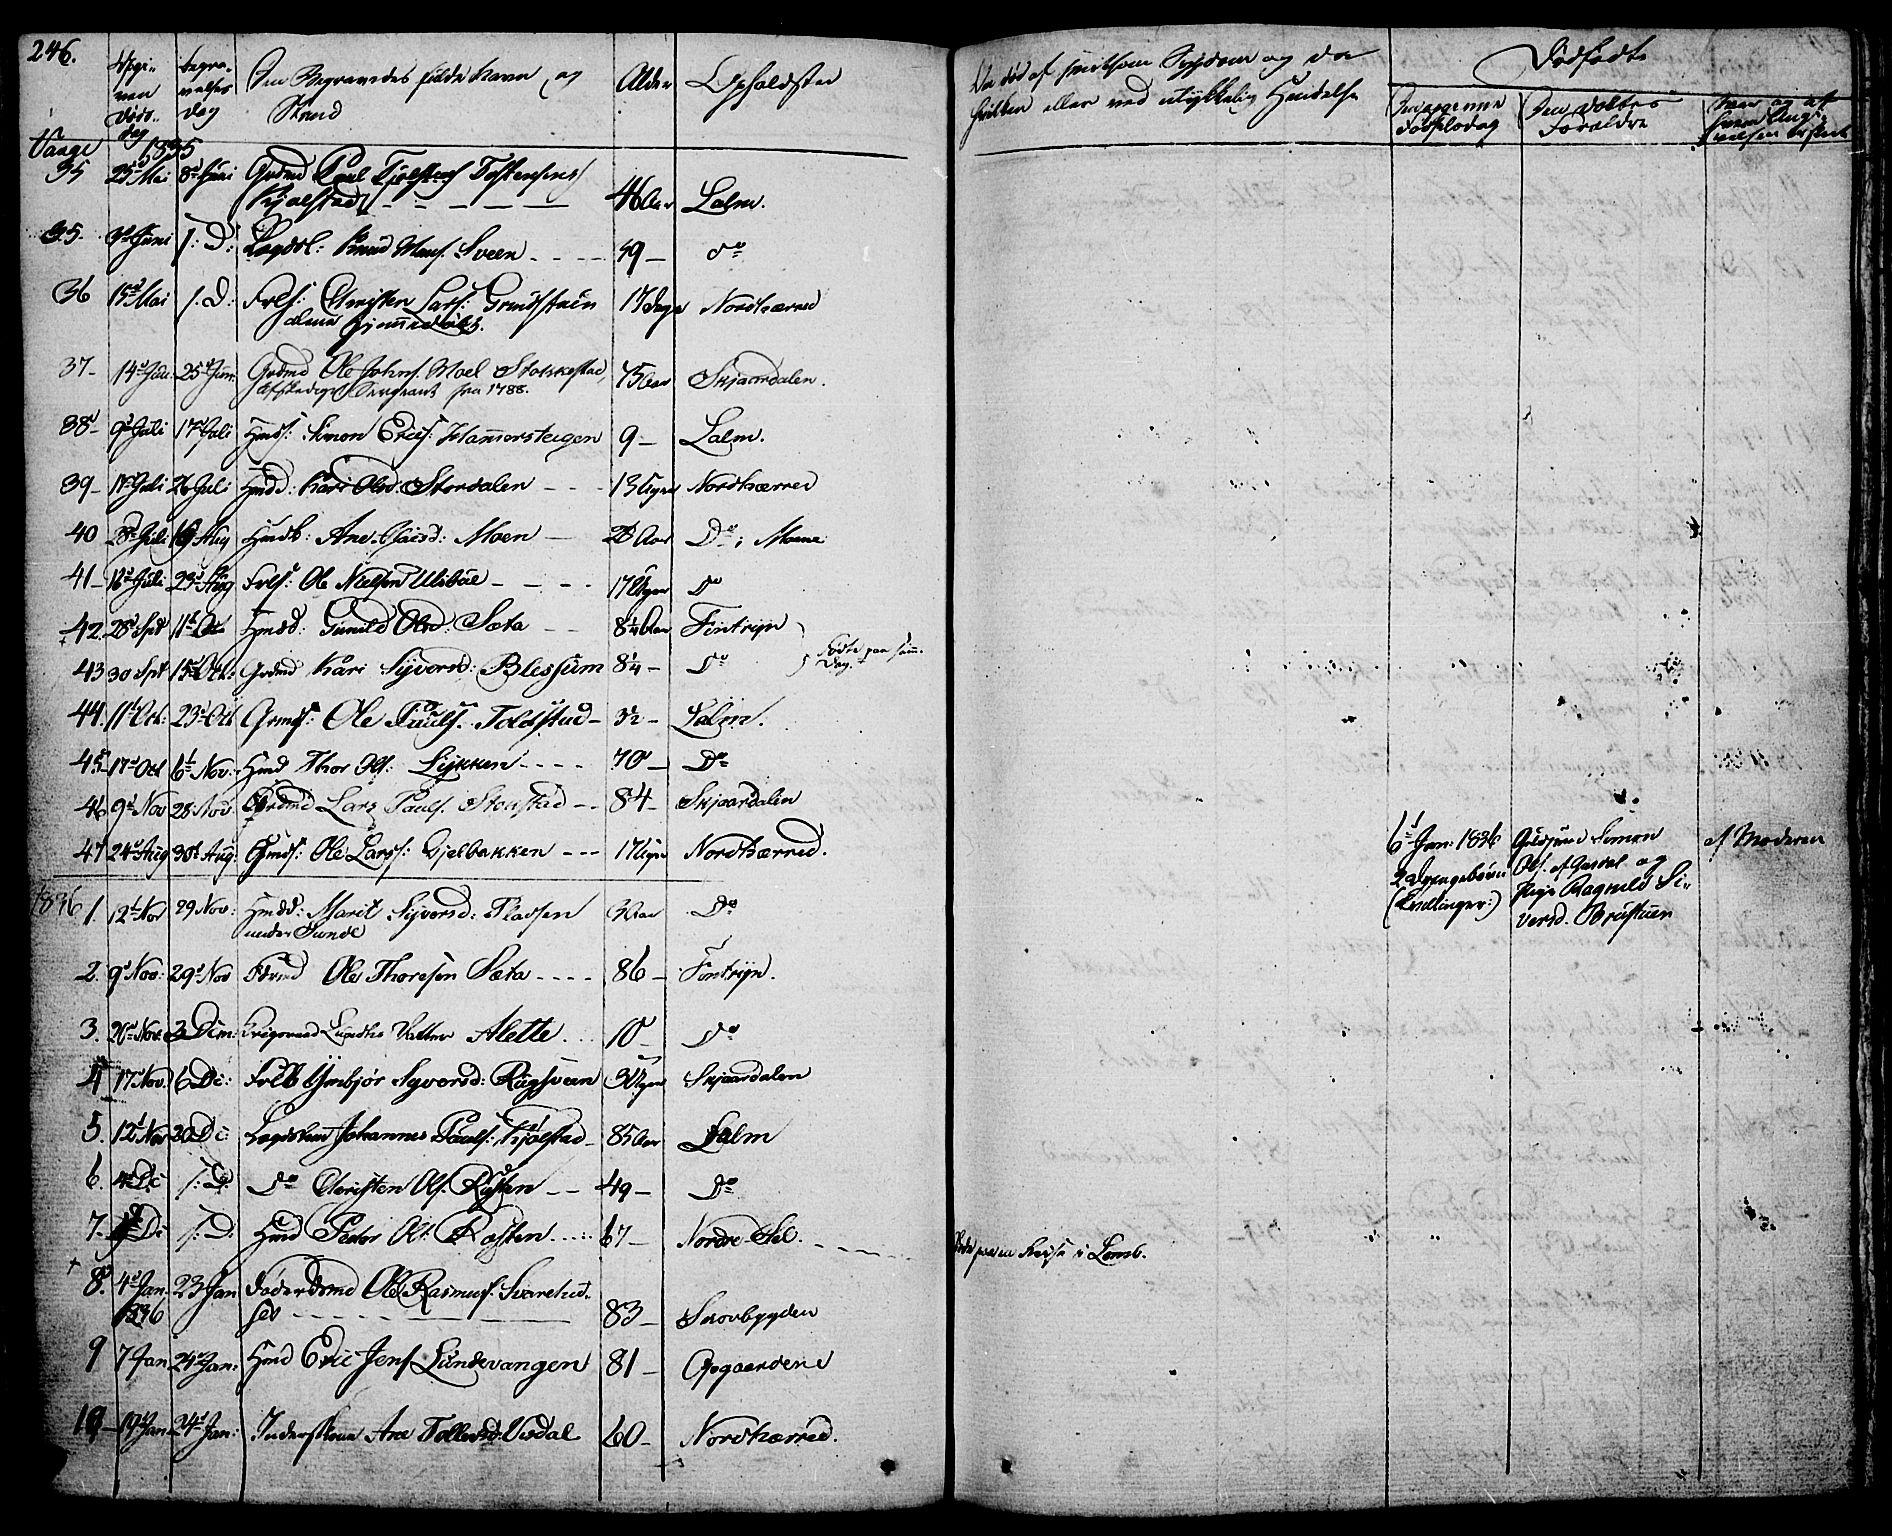 SAH, Vågå prestekontor, Ministerialbok nr. 4 /1, 1827-1842, s. 246